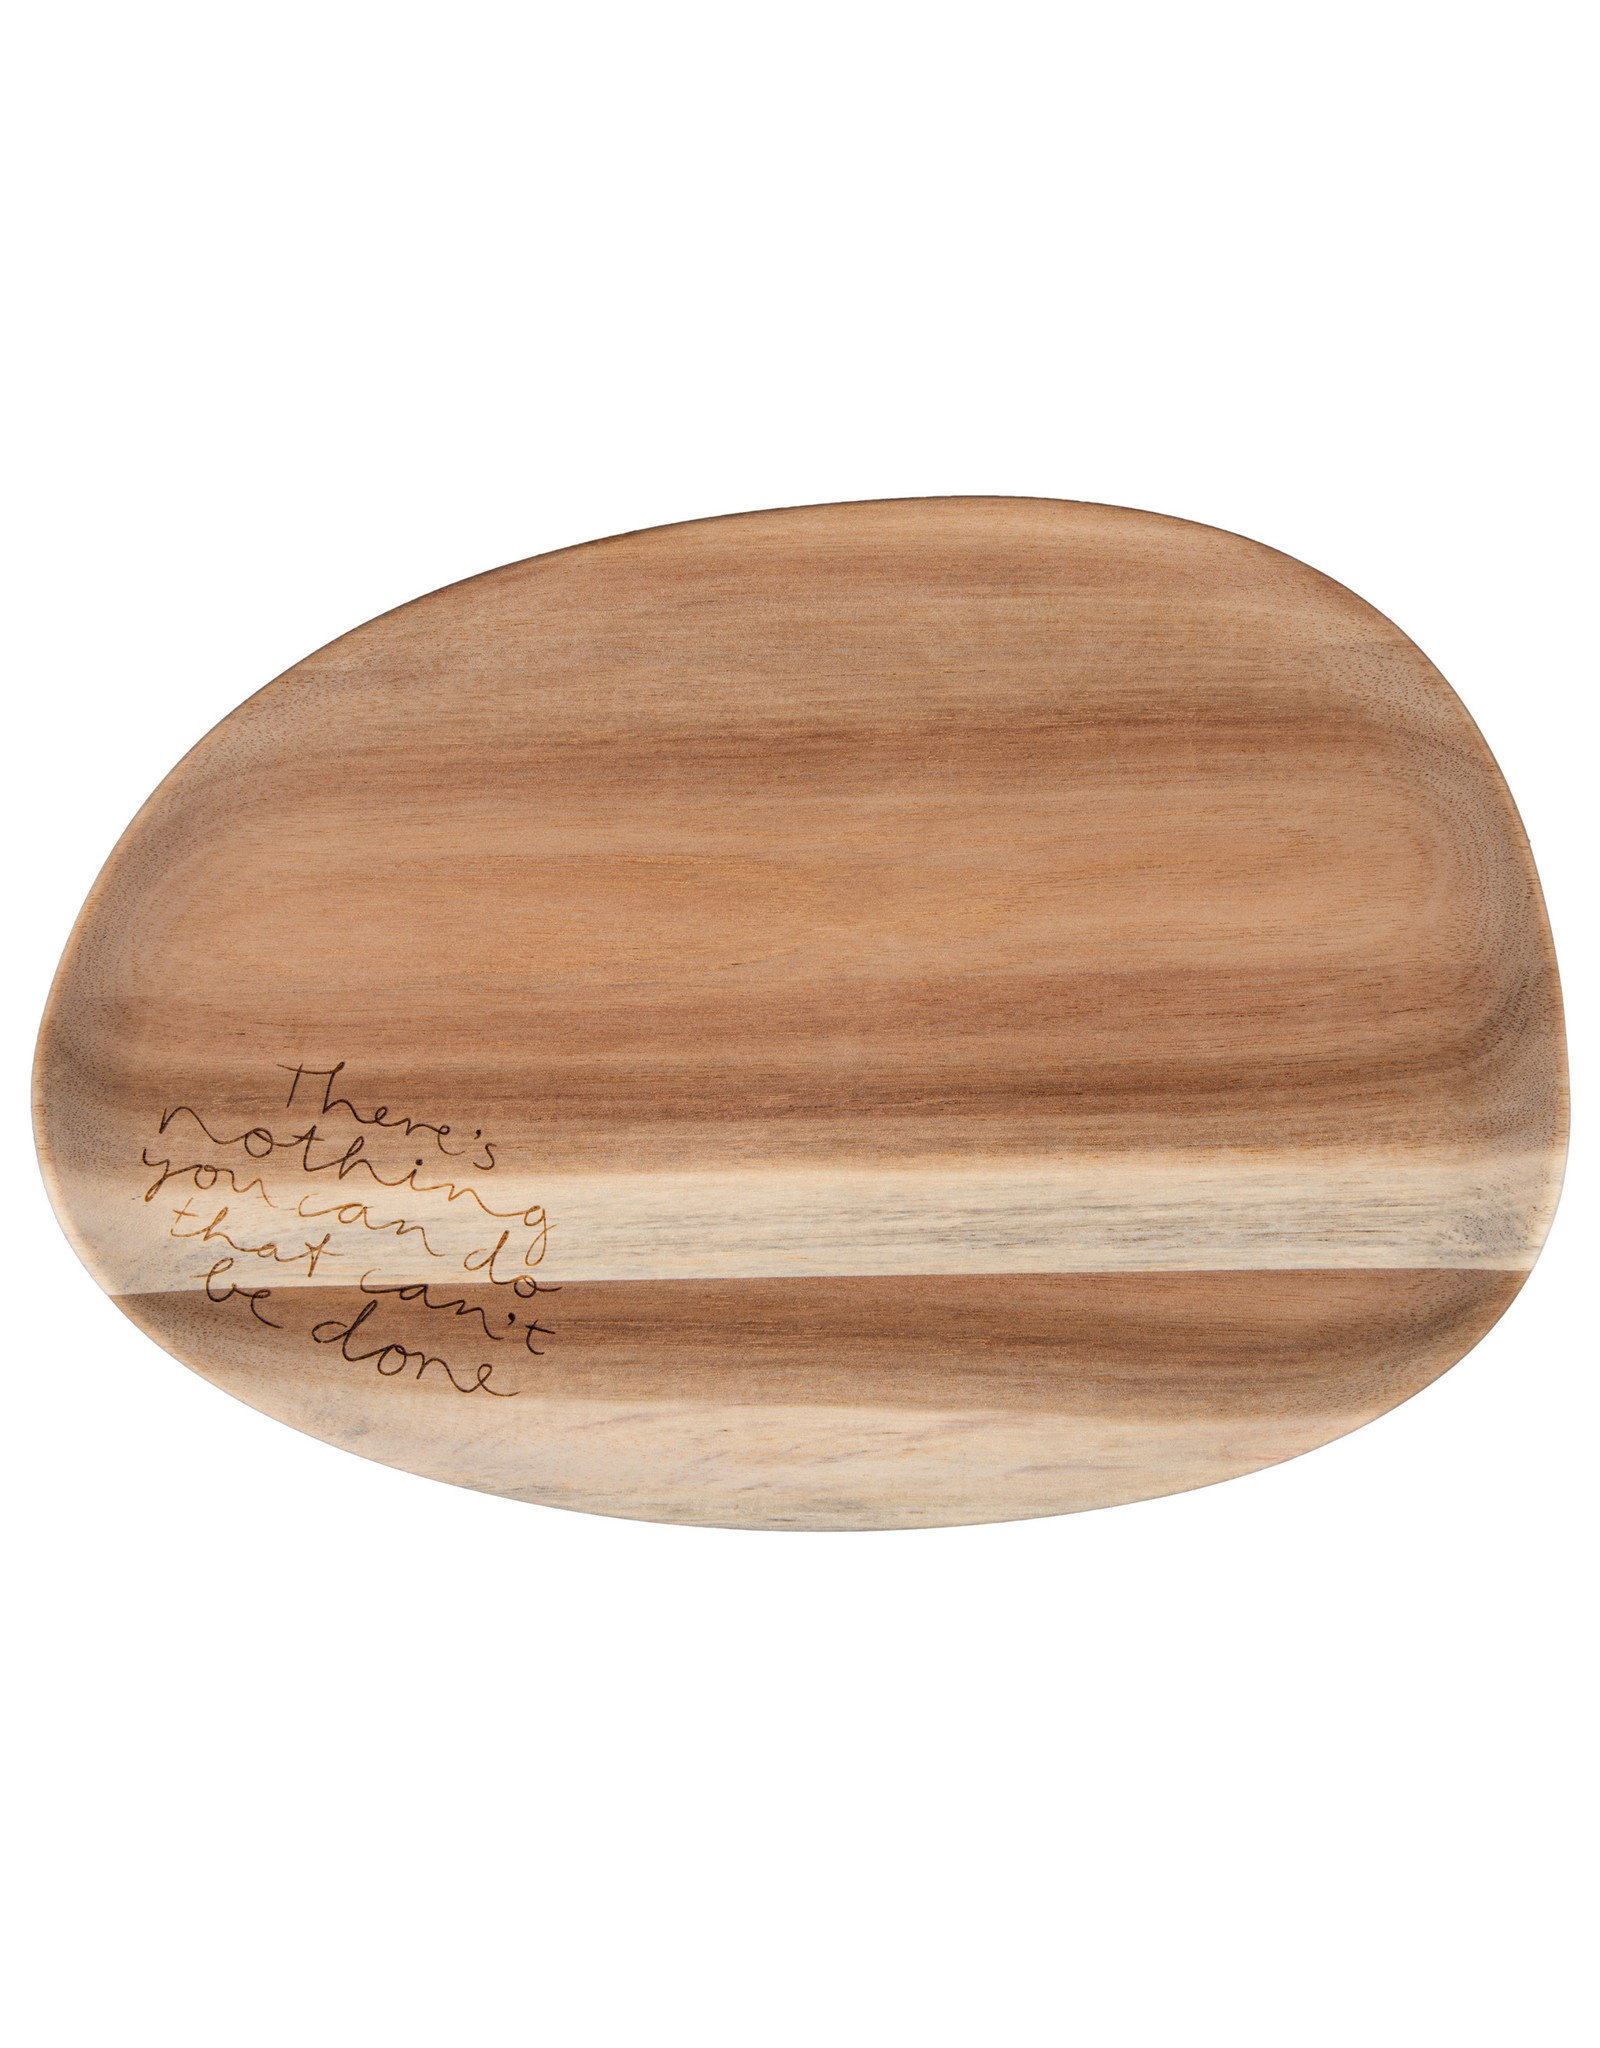 Raeder Wonderland tray wood medium There's nothing 32x21,5x2cm